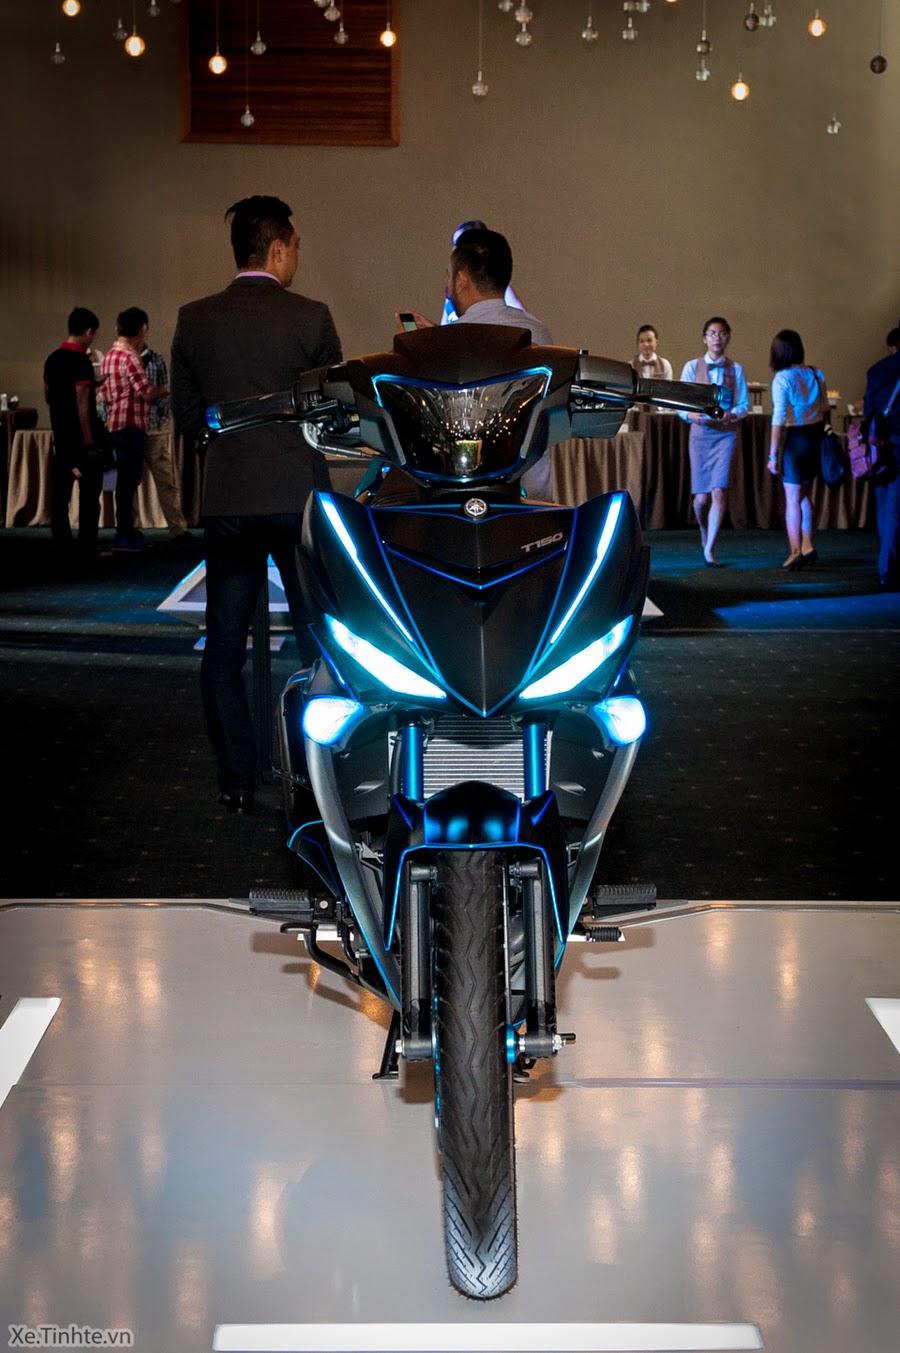 7 Yamaha Byson Streetfighter Berwajah KTM Duke Wallpaper Car And